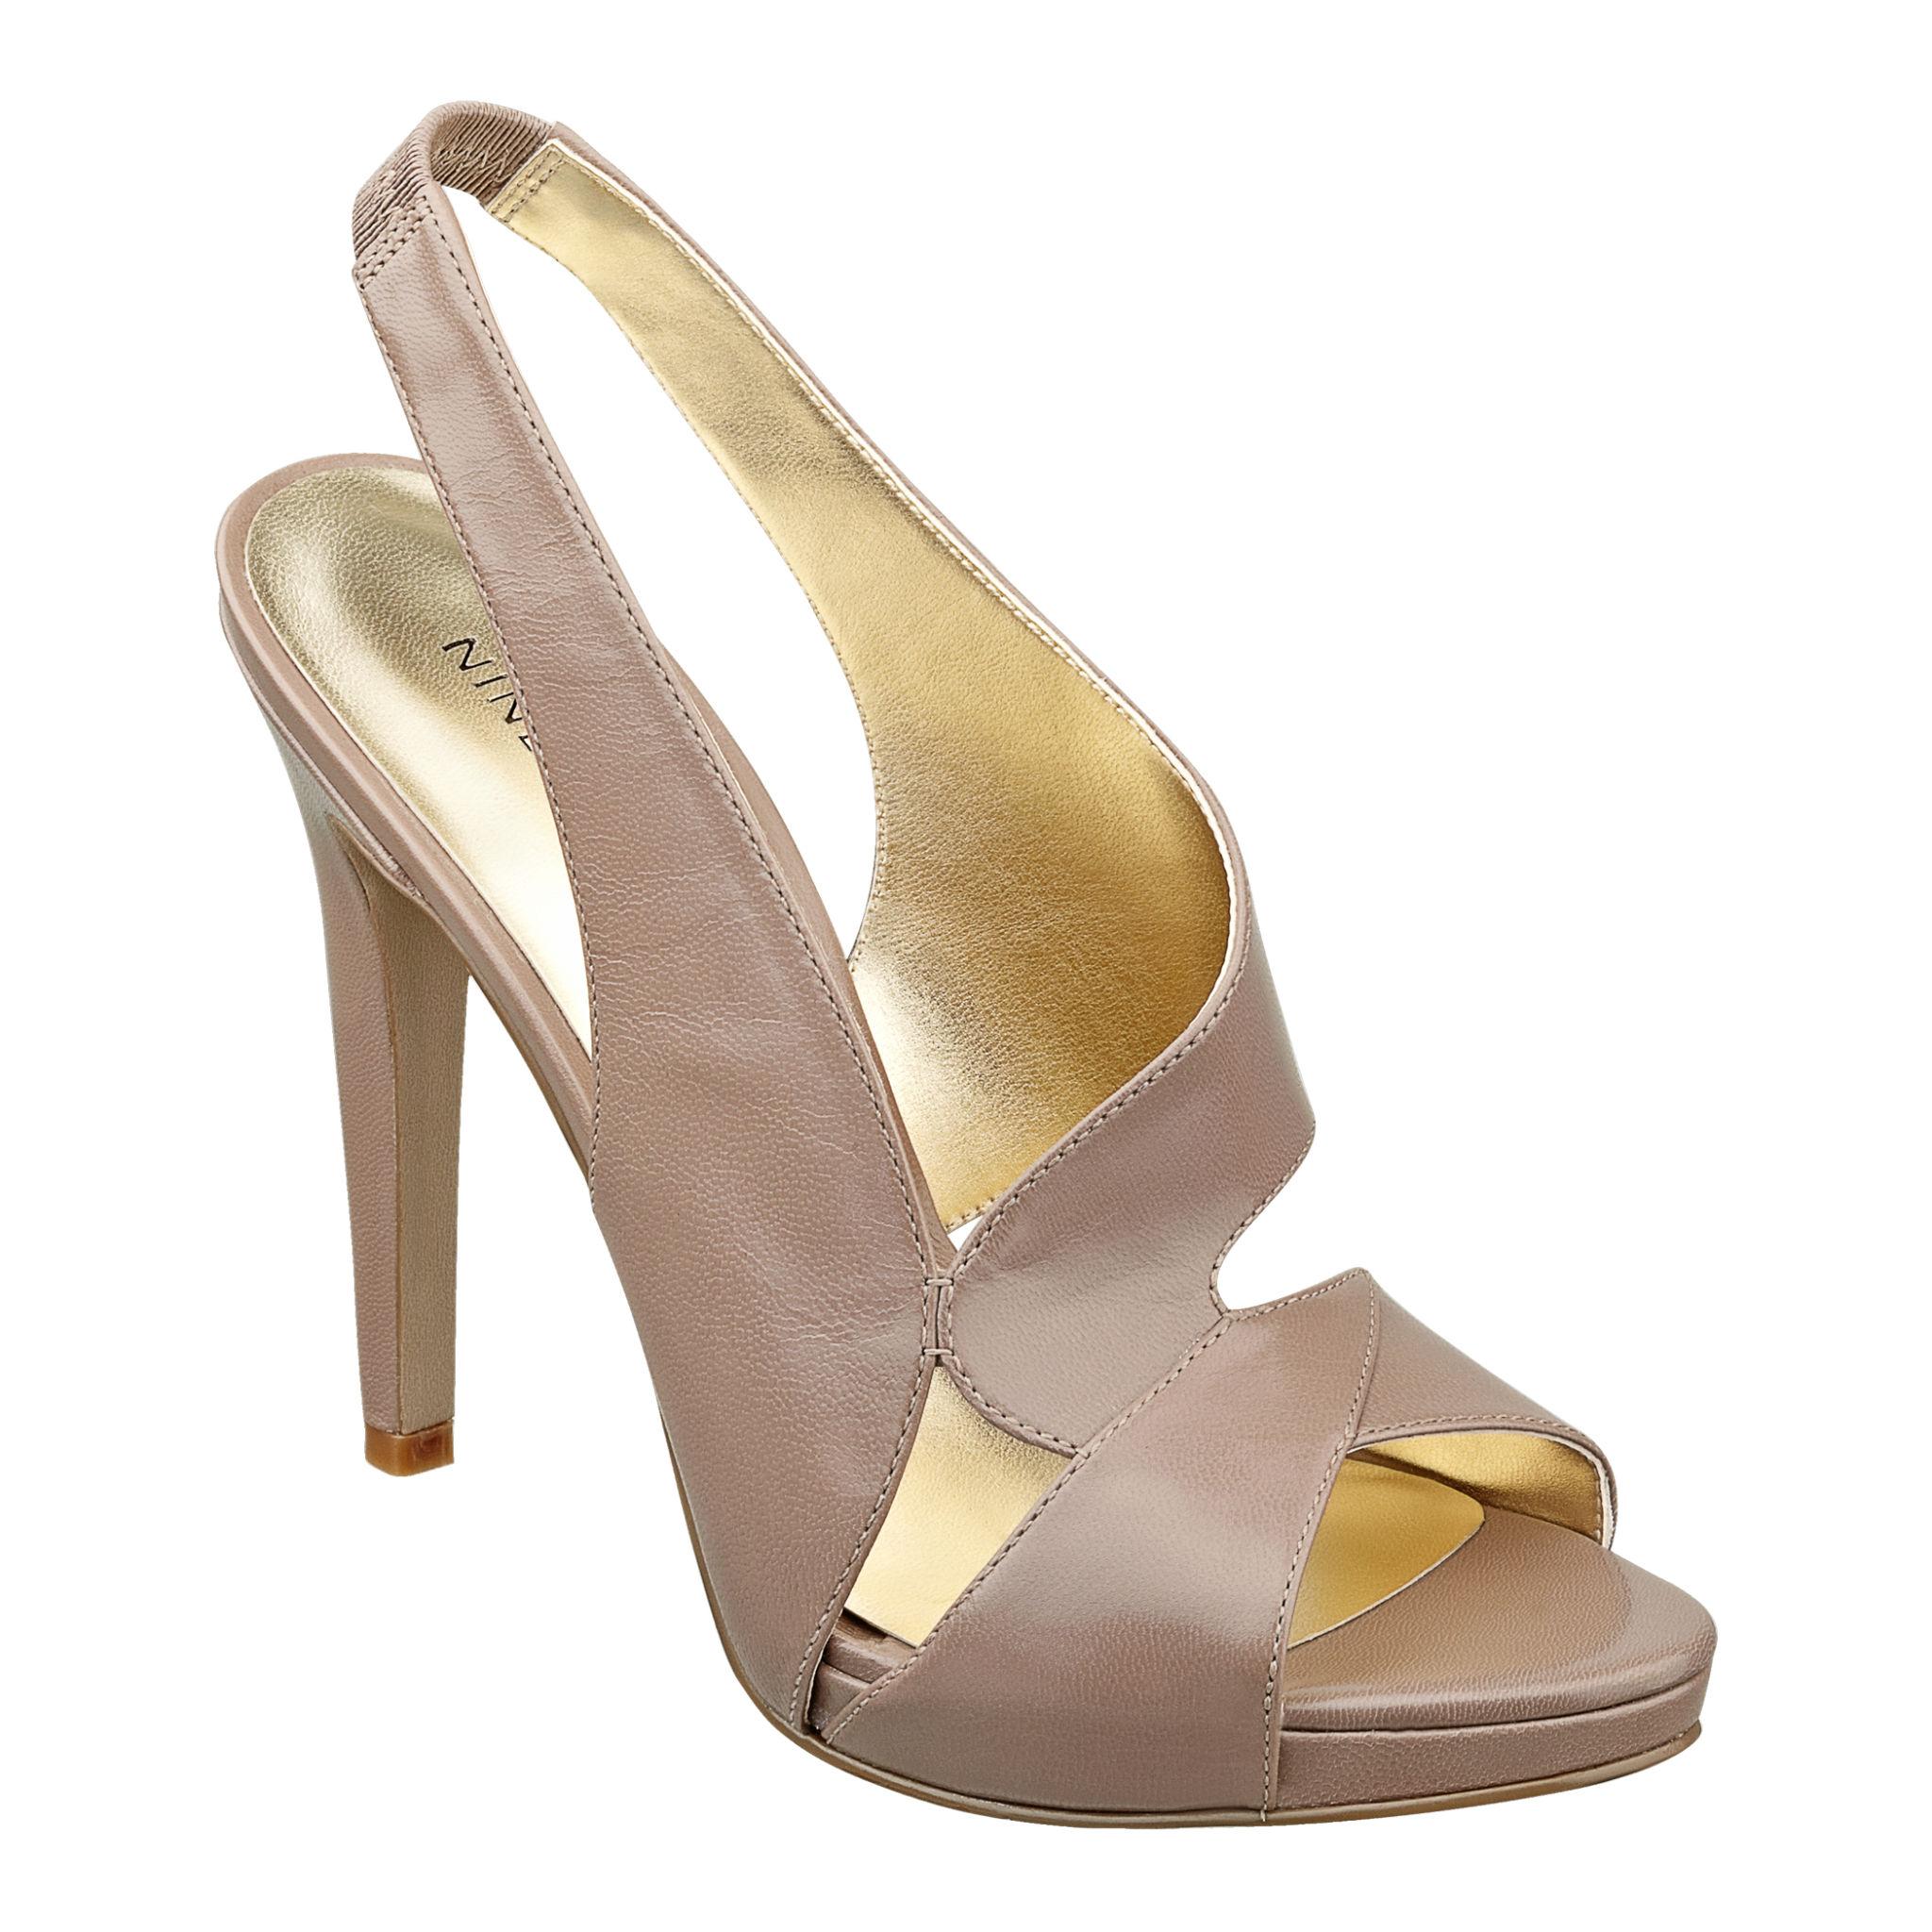 Nine West Joansa sandal